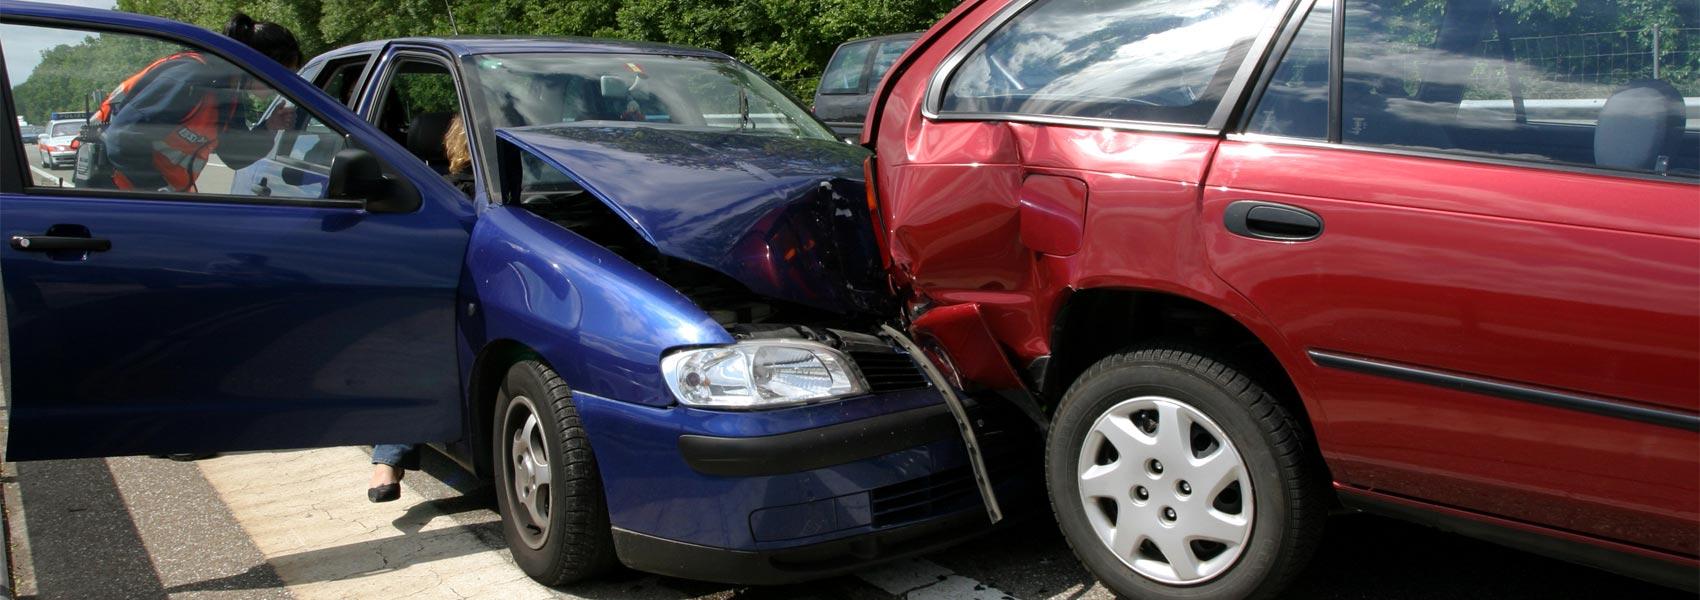 Michigan Car Accident Laws